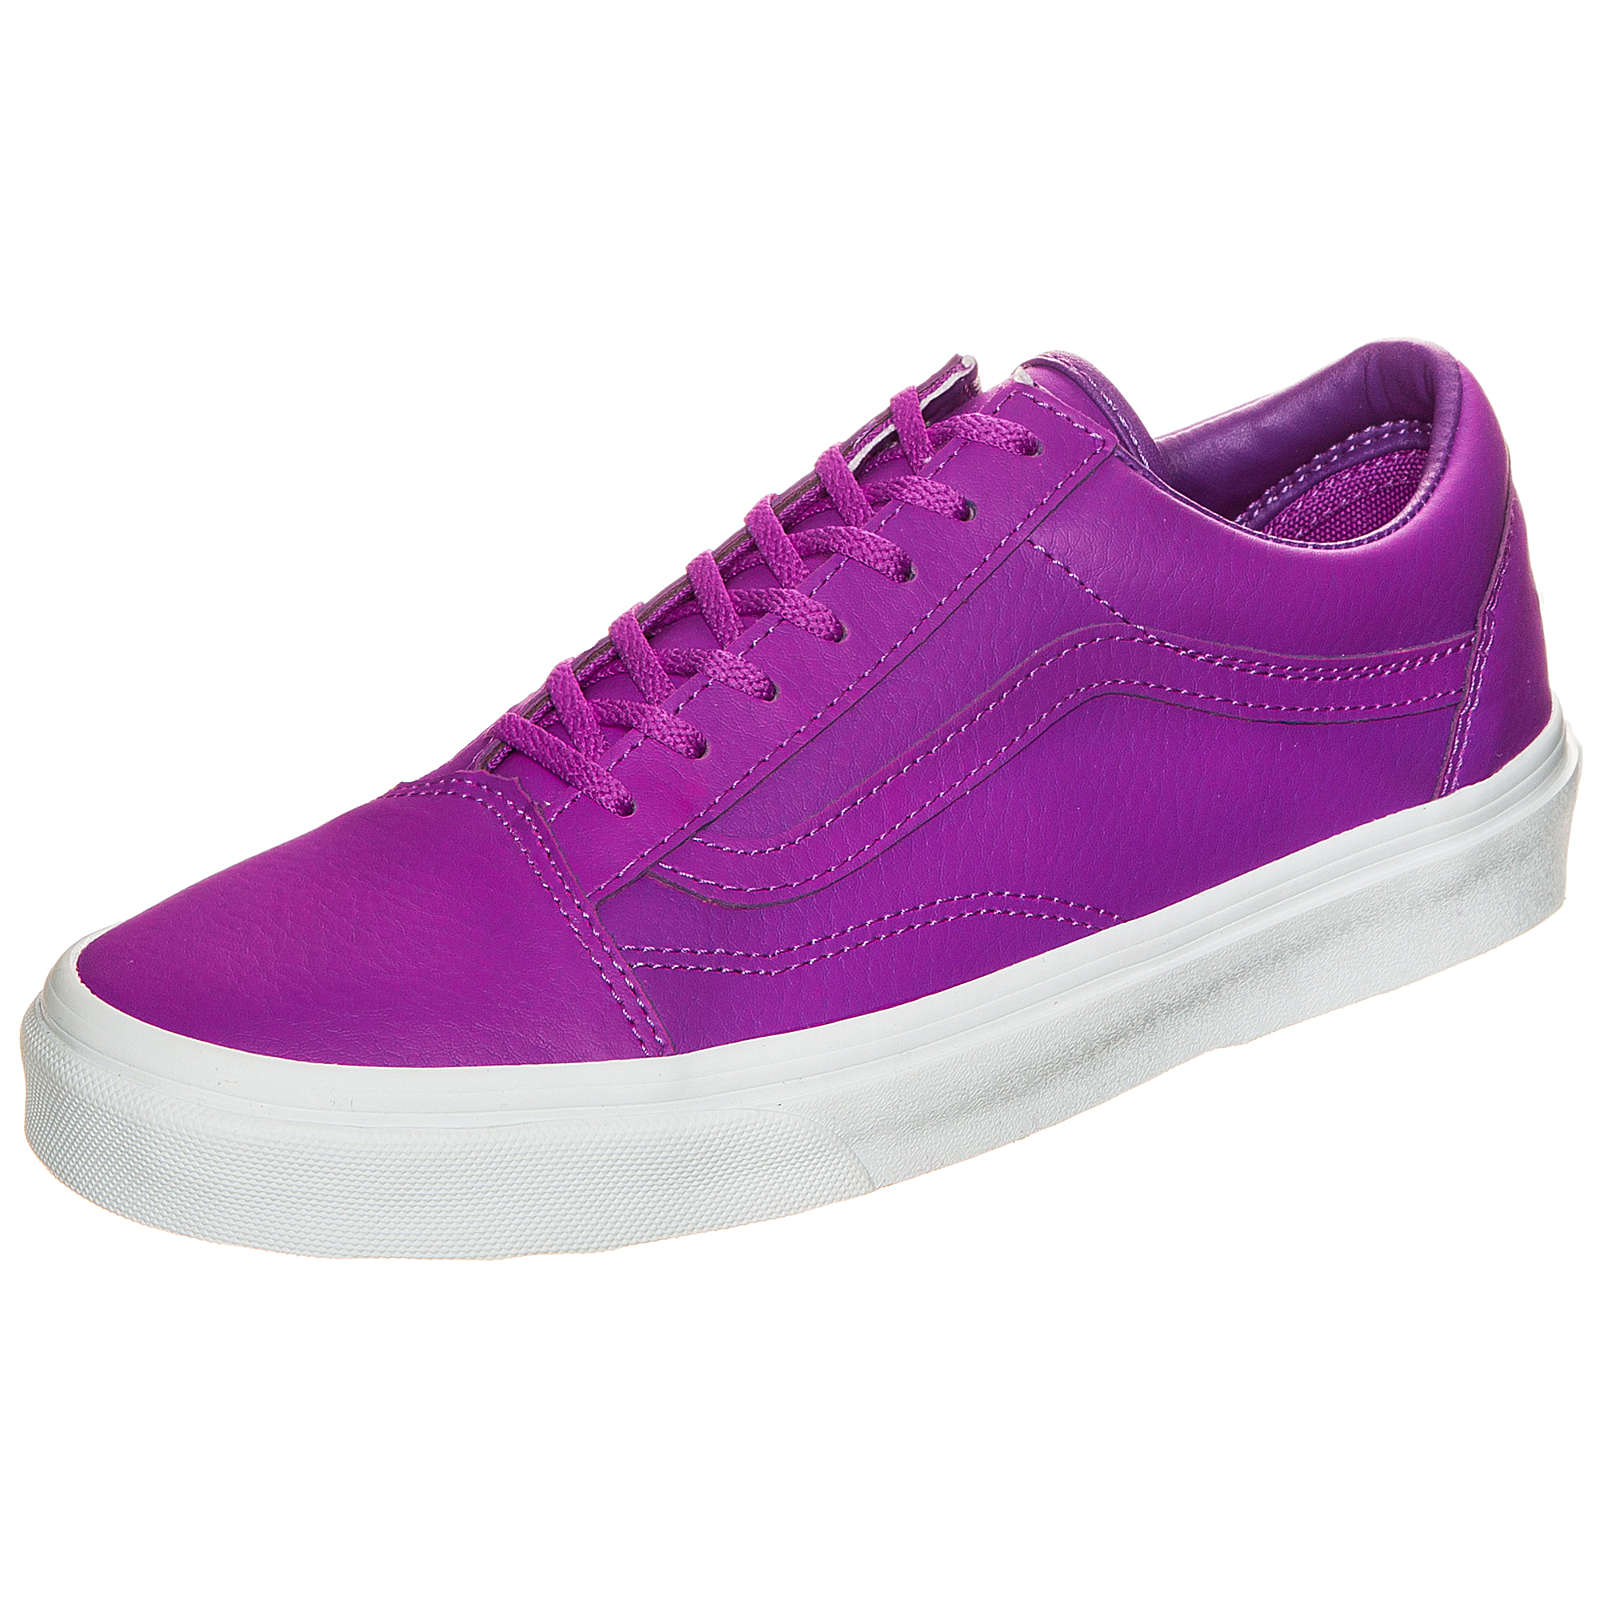 Vans Old Skool Sneaker lila Damen Gr. 37 zum Shop